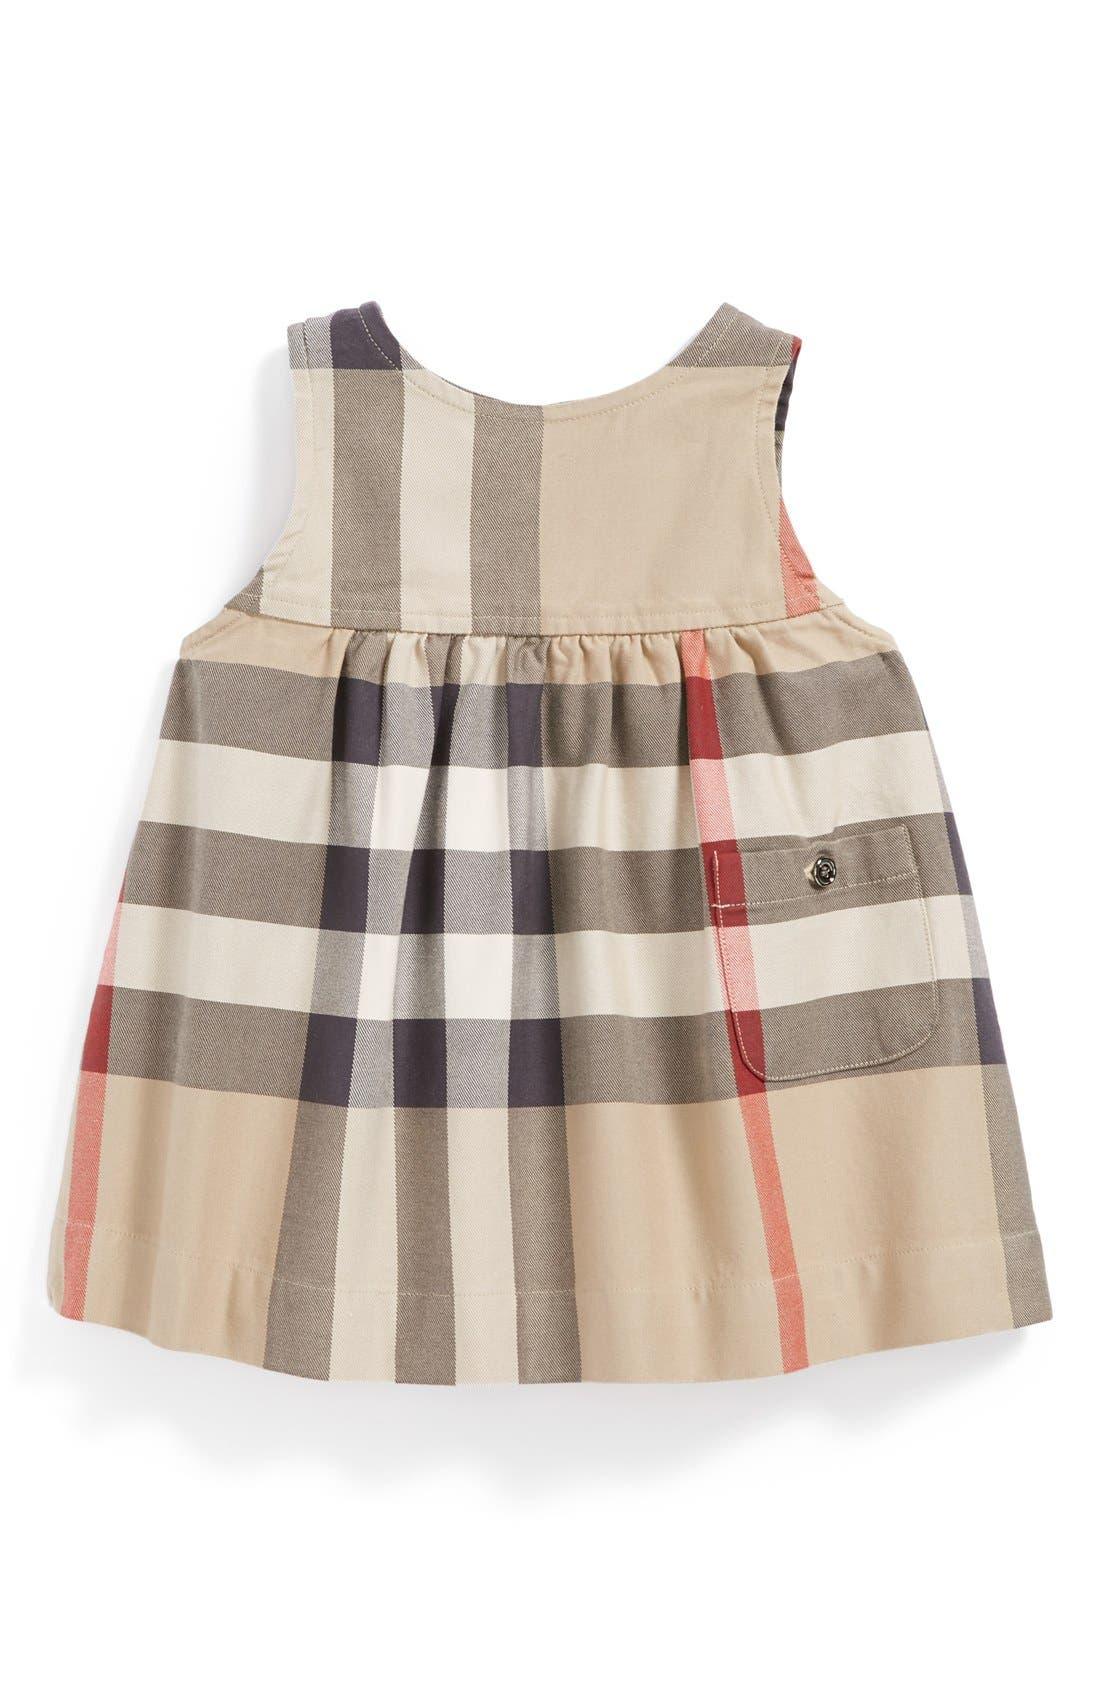 Burberry Sleeveless Check Dress Baby Girls